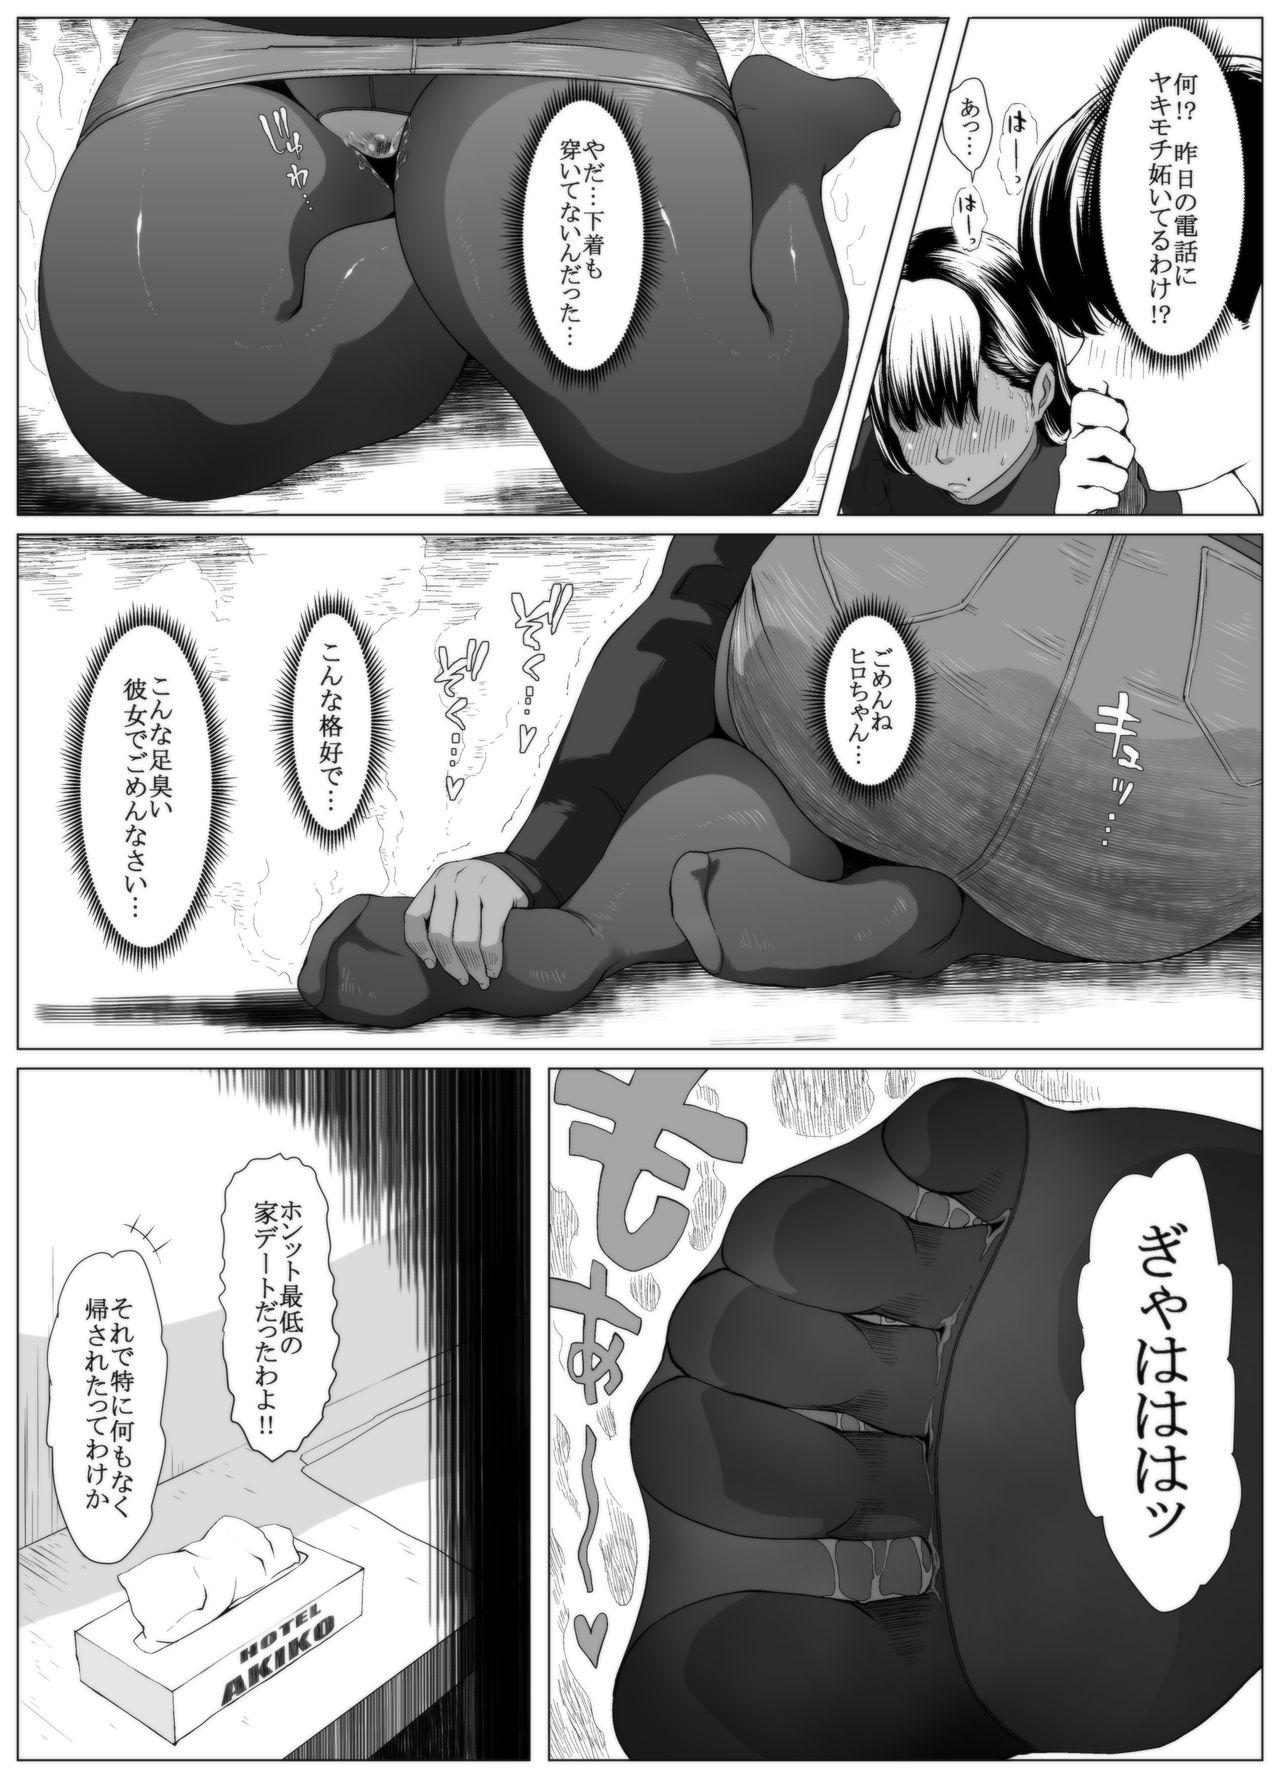 Koufukuron - Murase Ayumi Hen MANIAC: 1 6